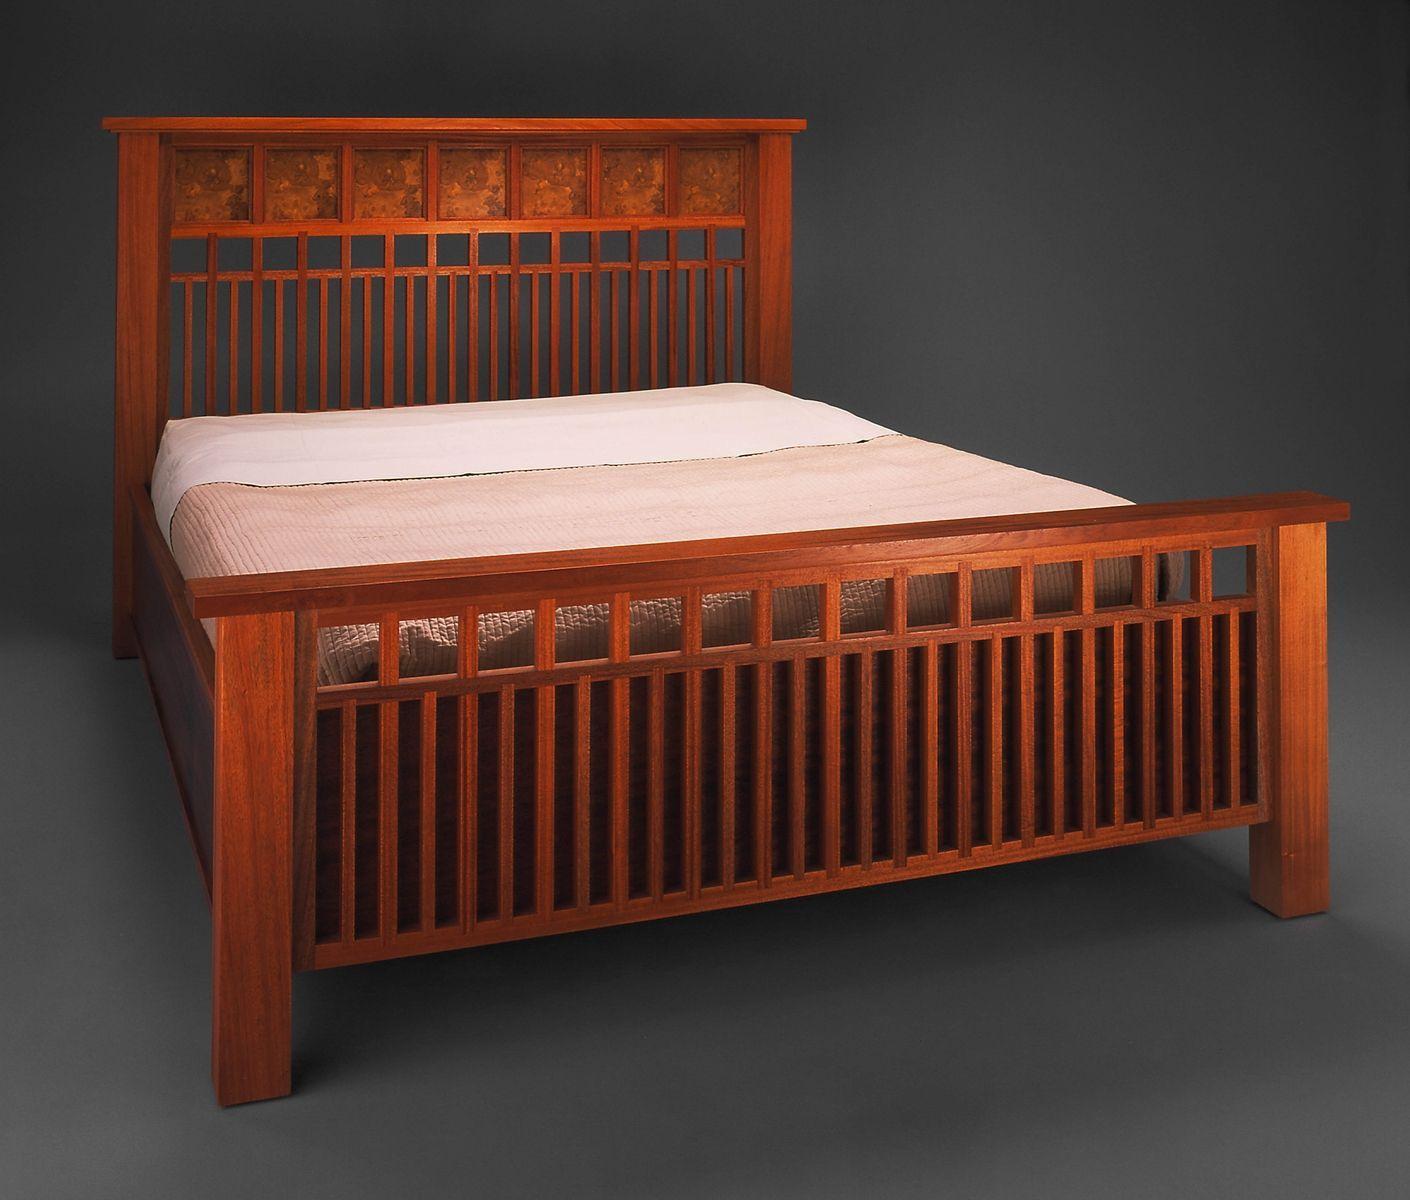 Custom Made Caroline\'s Bed | Woodworking | Pinterest